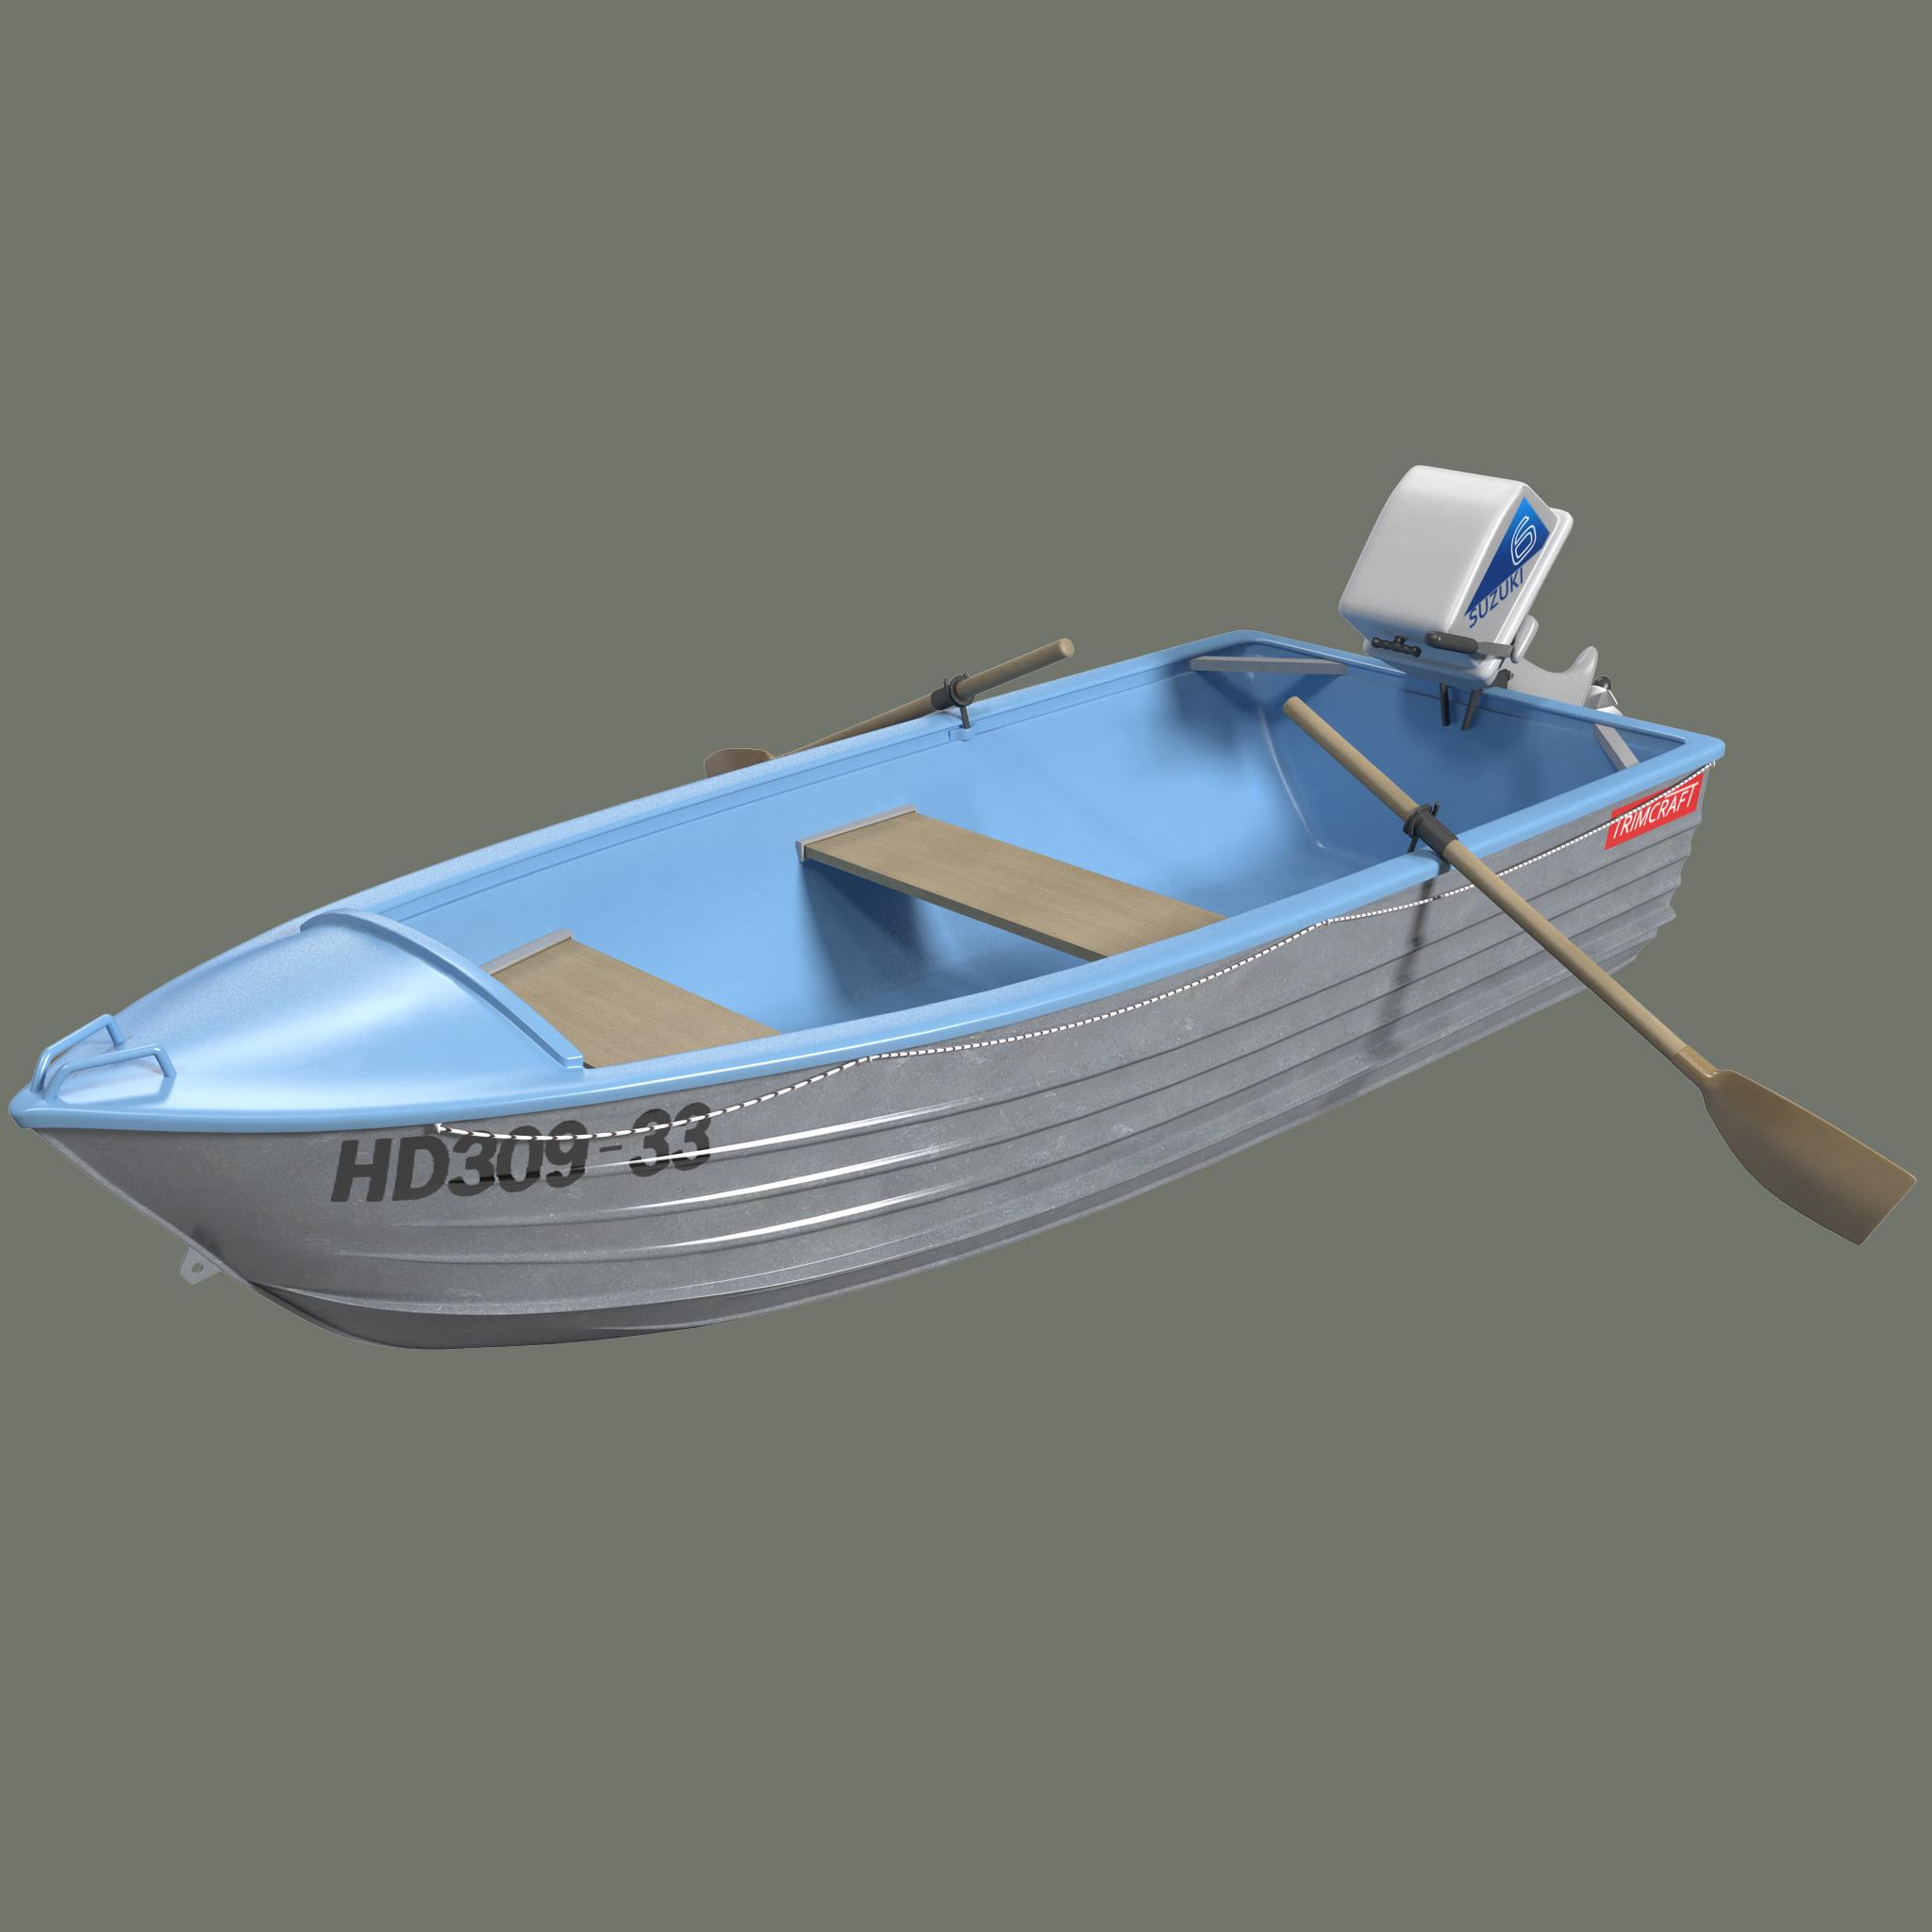 3d model trimcraft boat